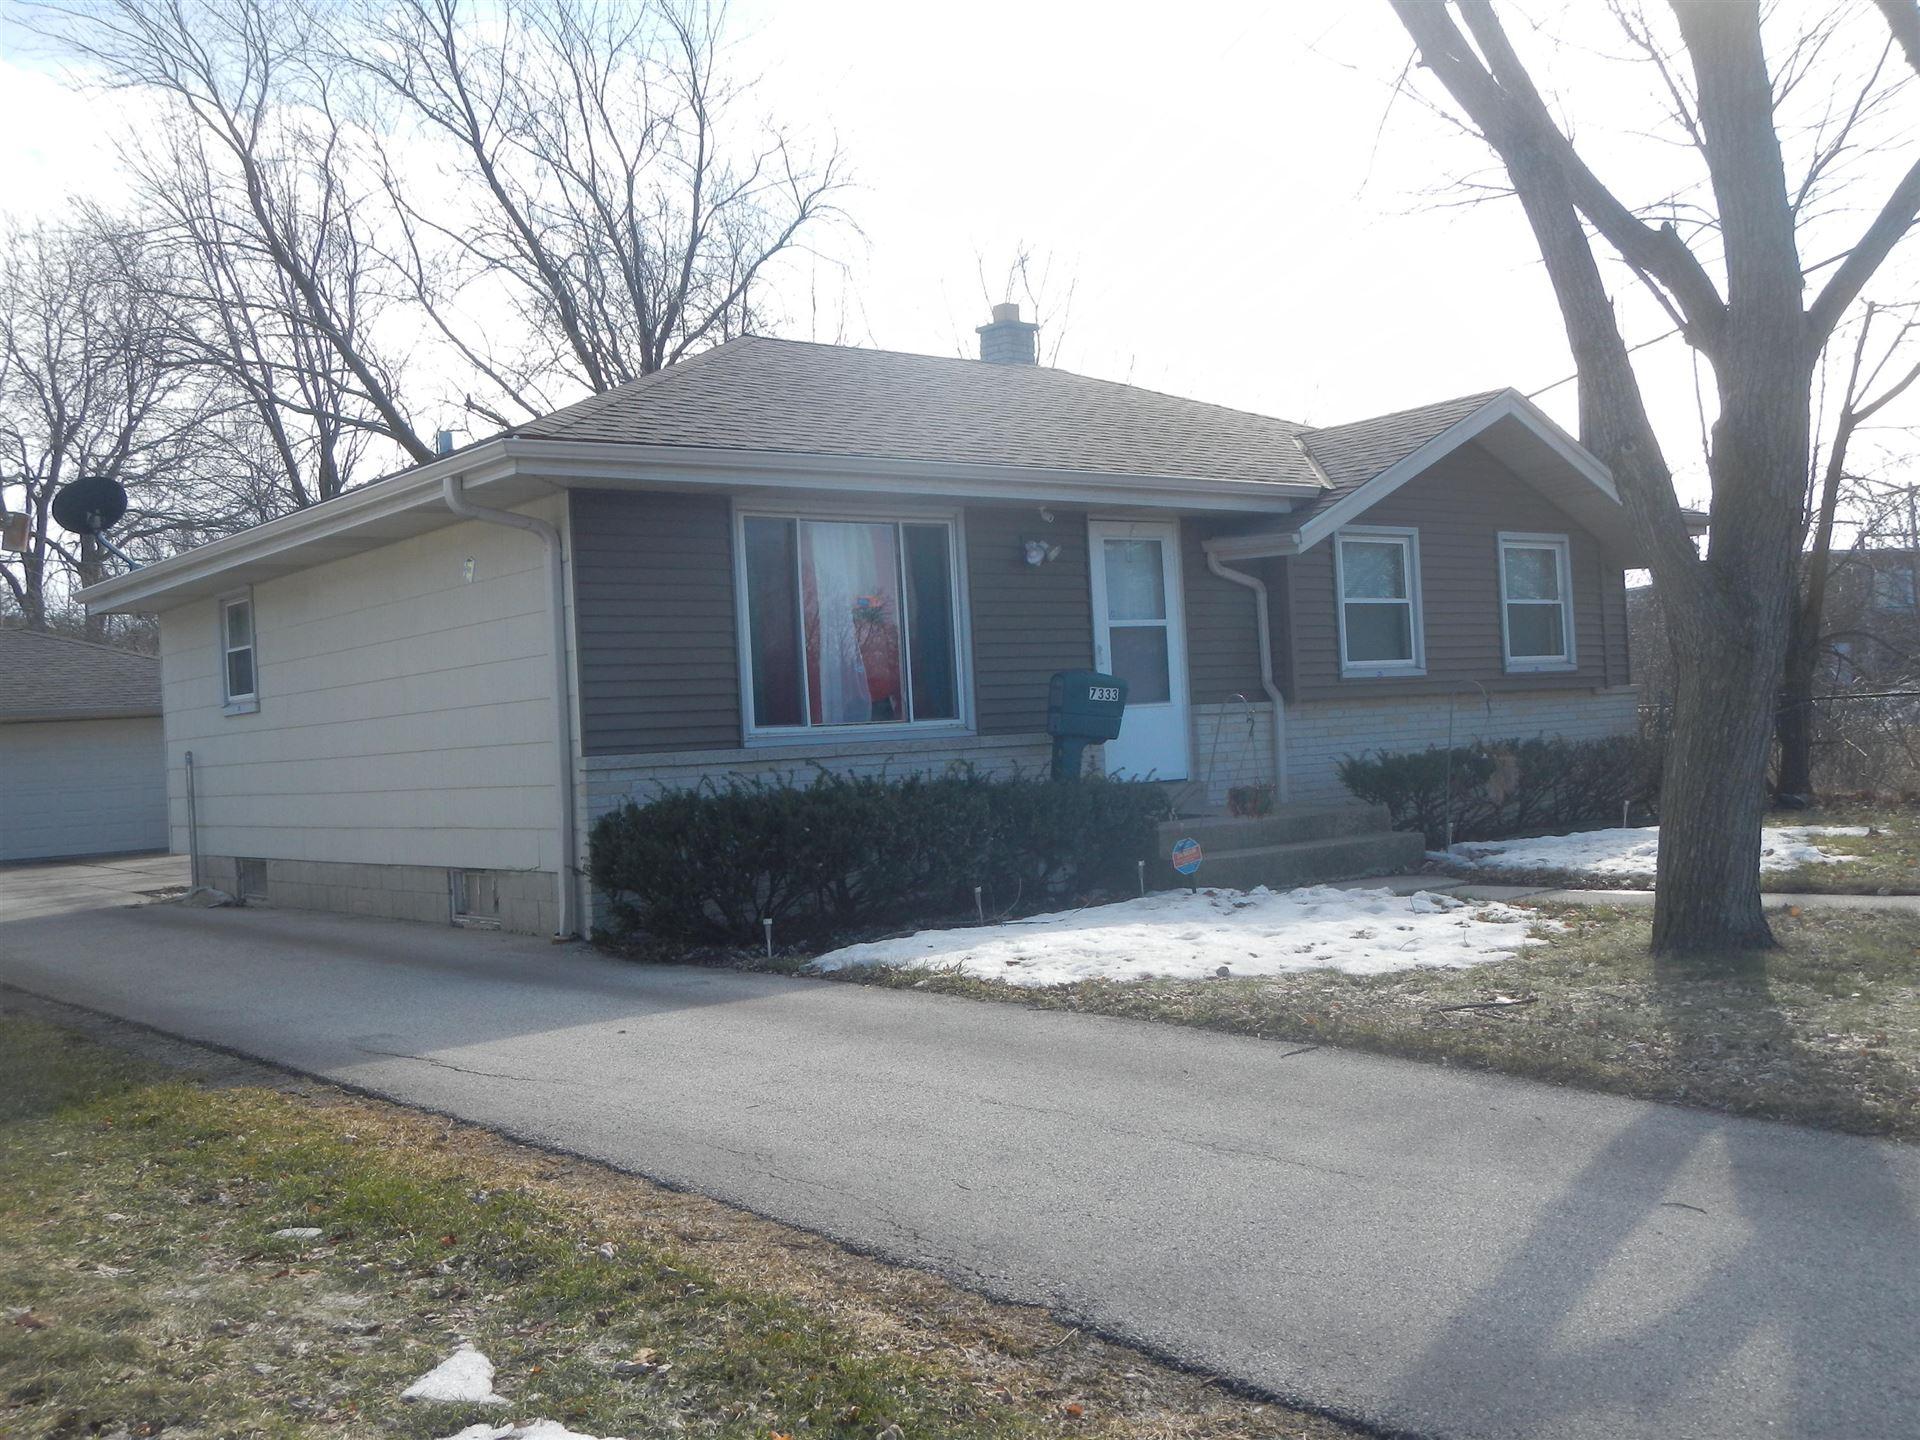 7333 W Acacia St, Milwaukee, WI 53223 - #: 1679579